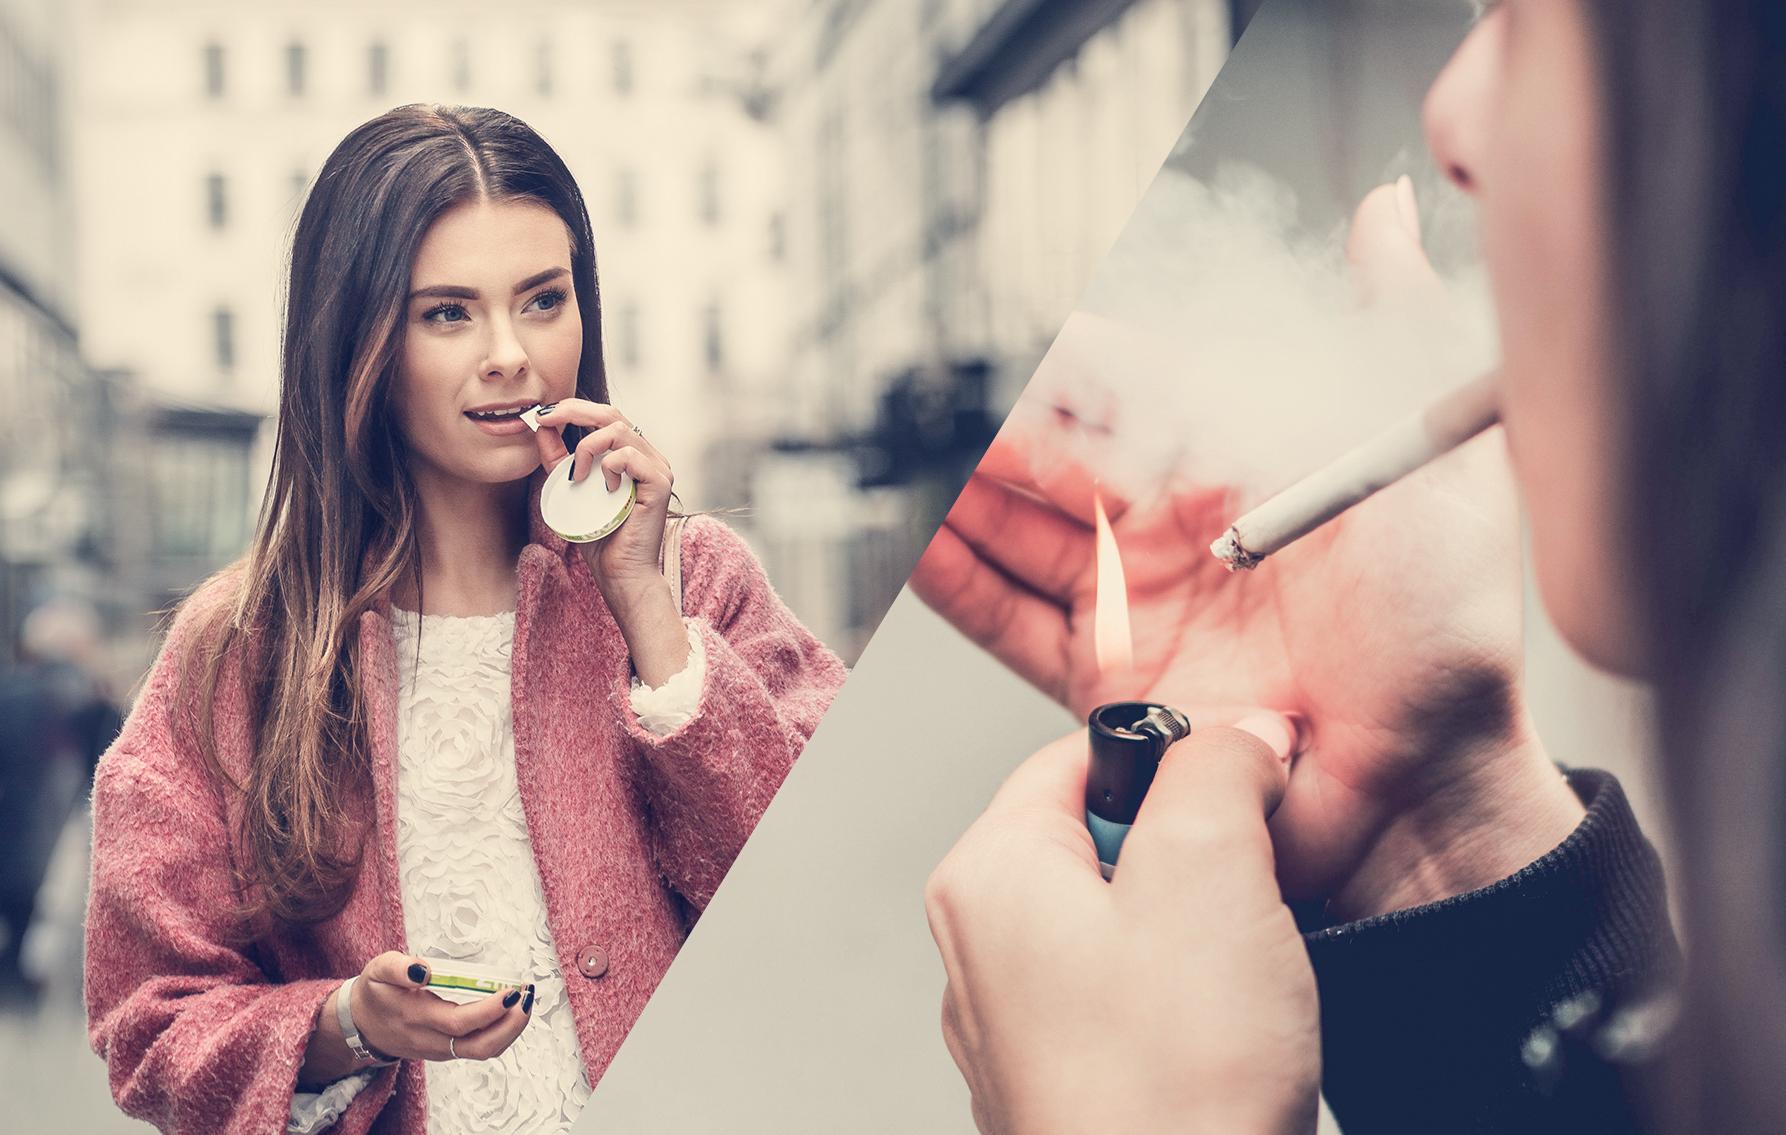 Nicotine and exercise